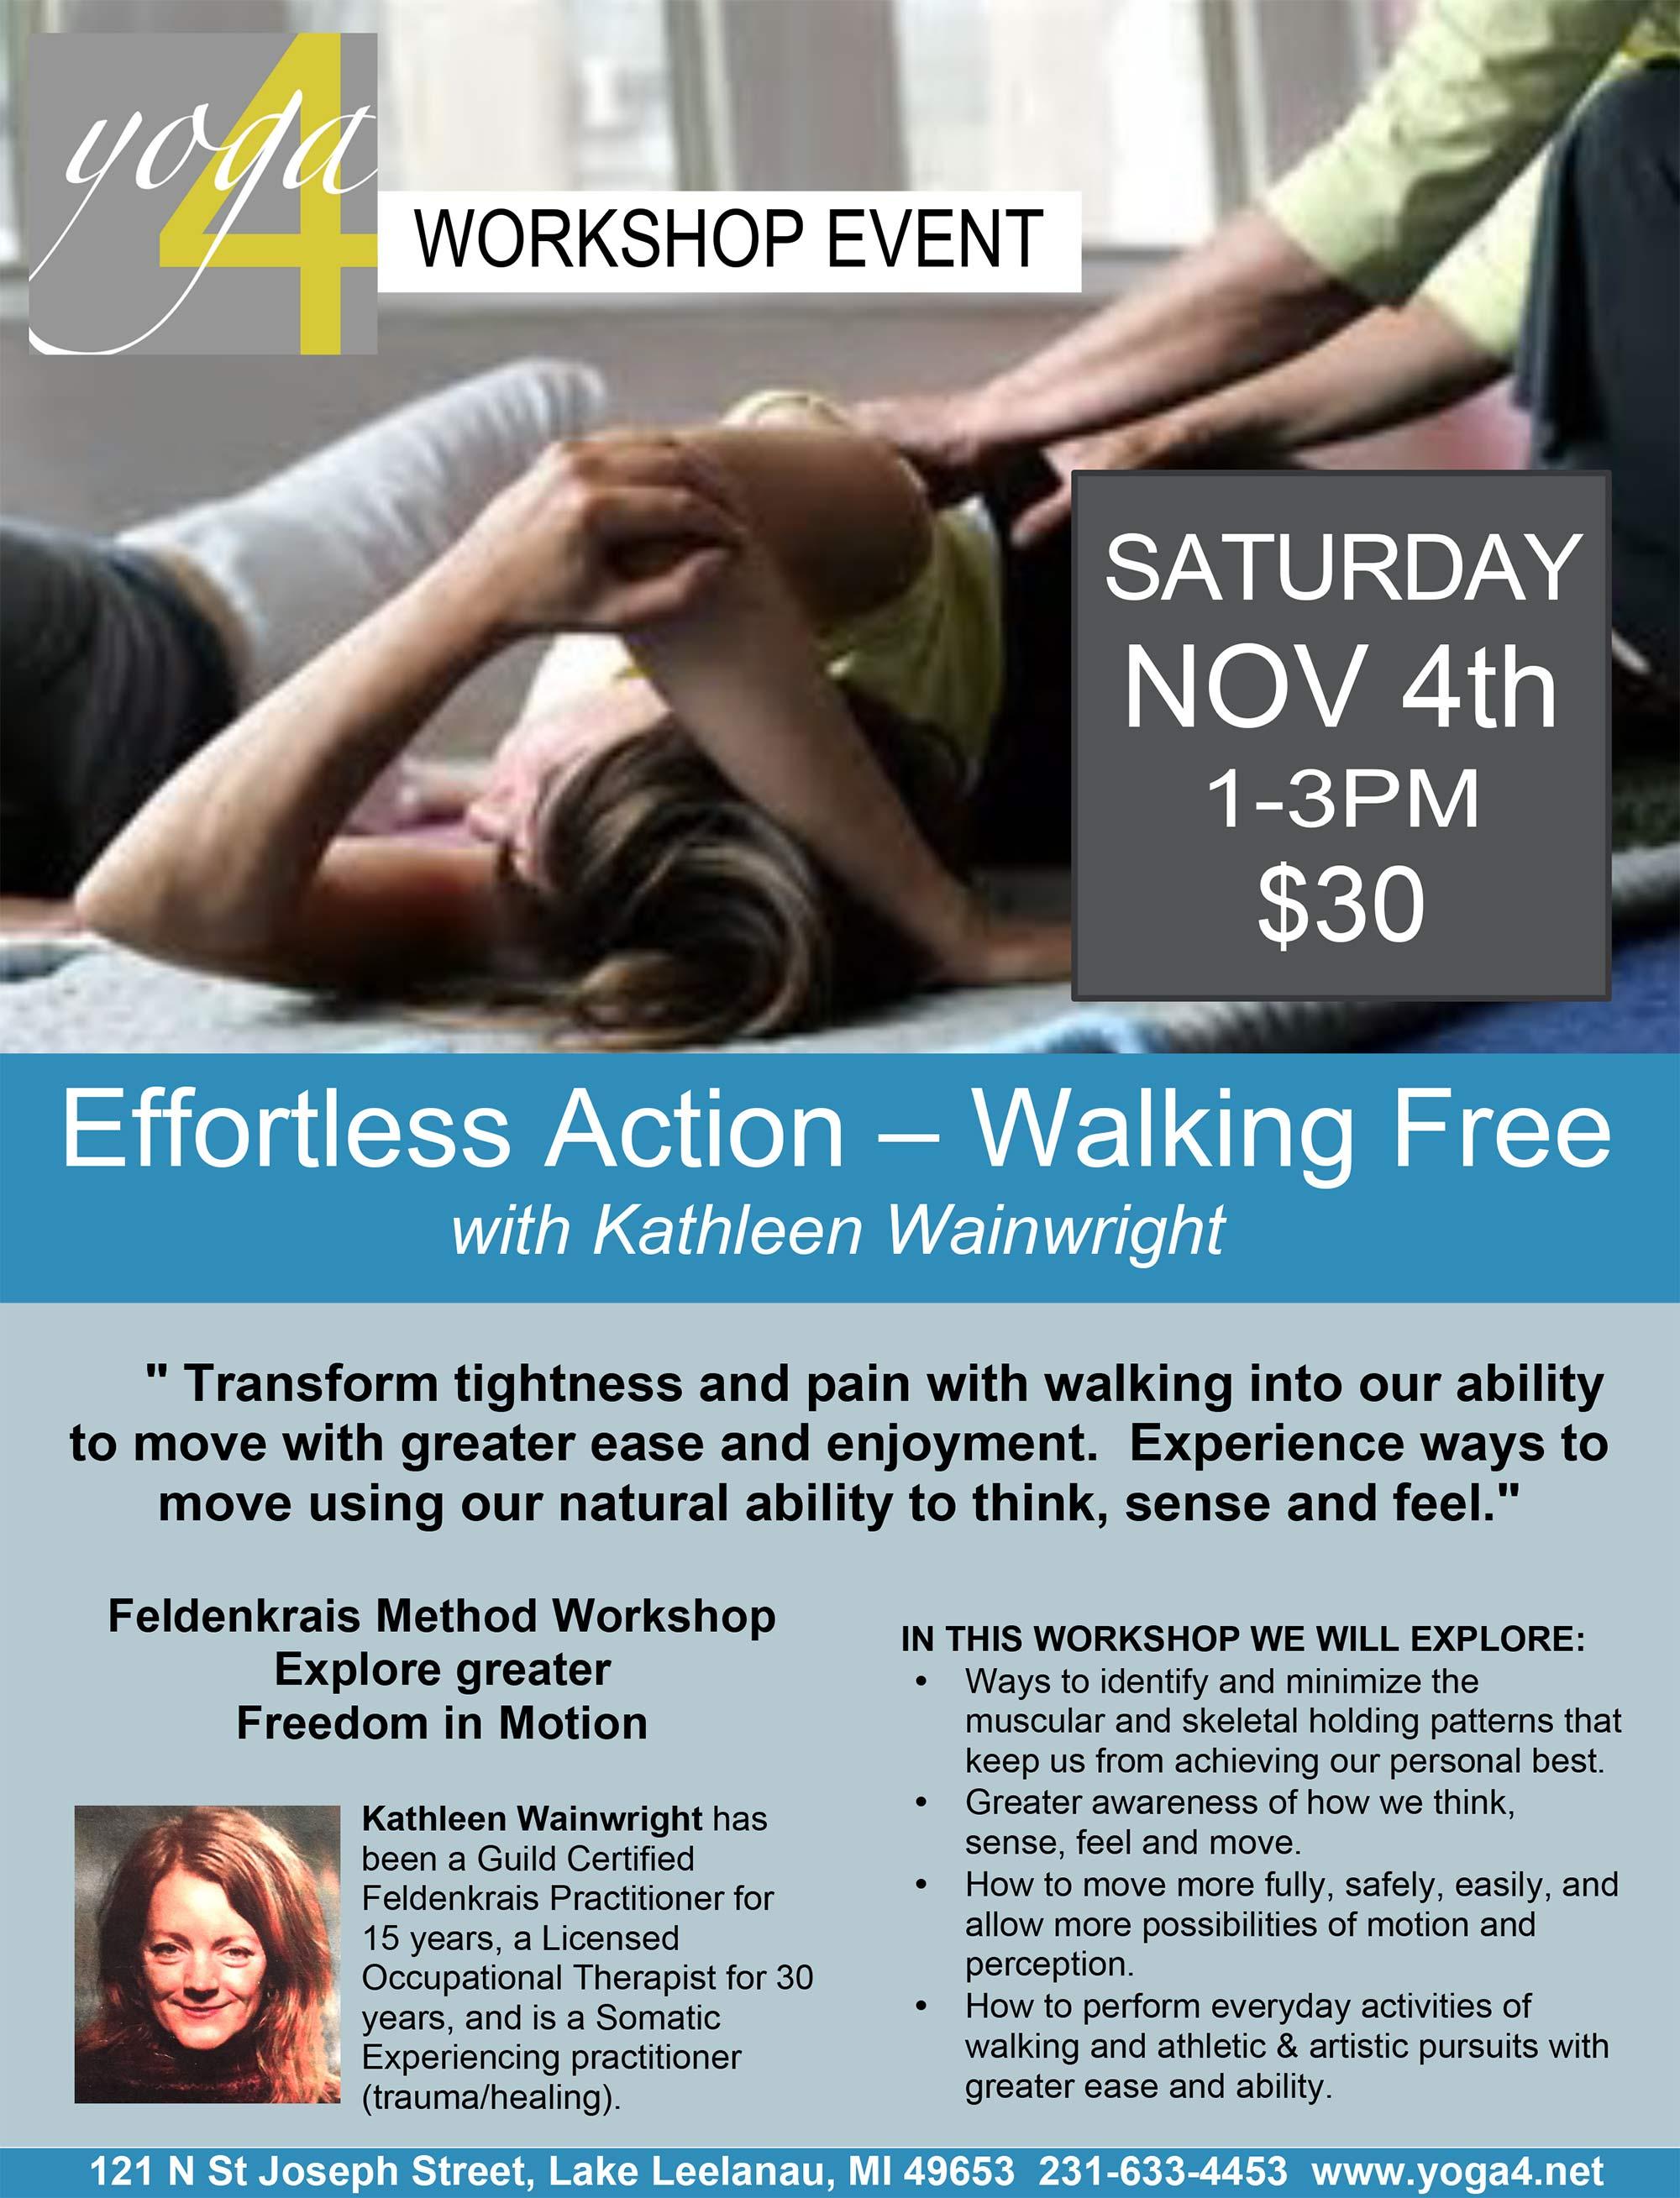 Effortless Action - Walking Free.jpg